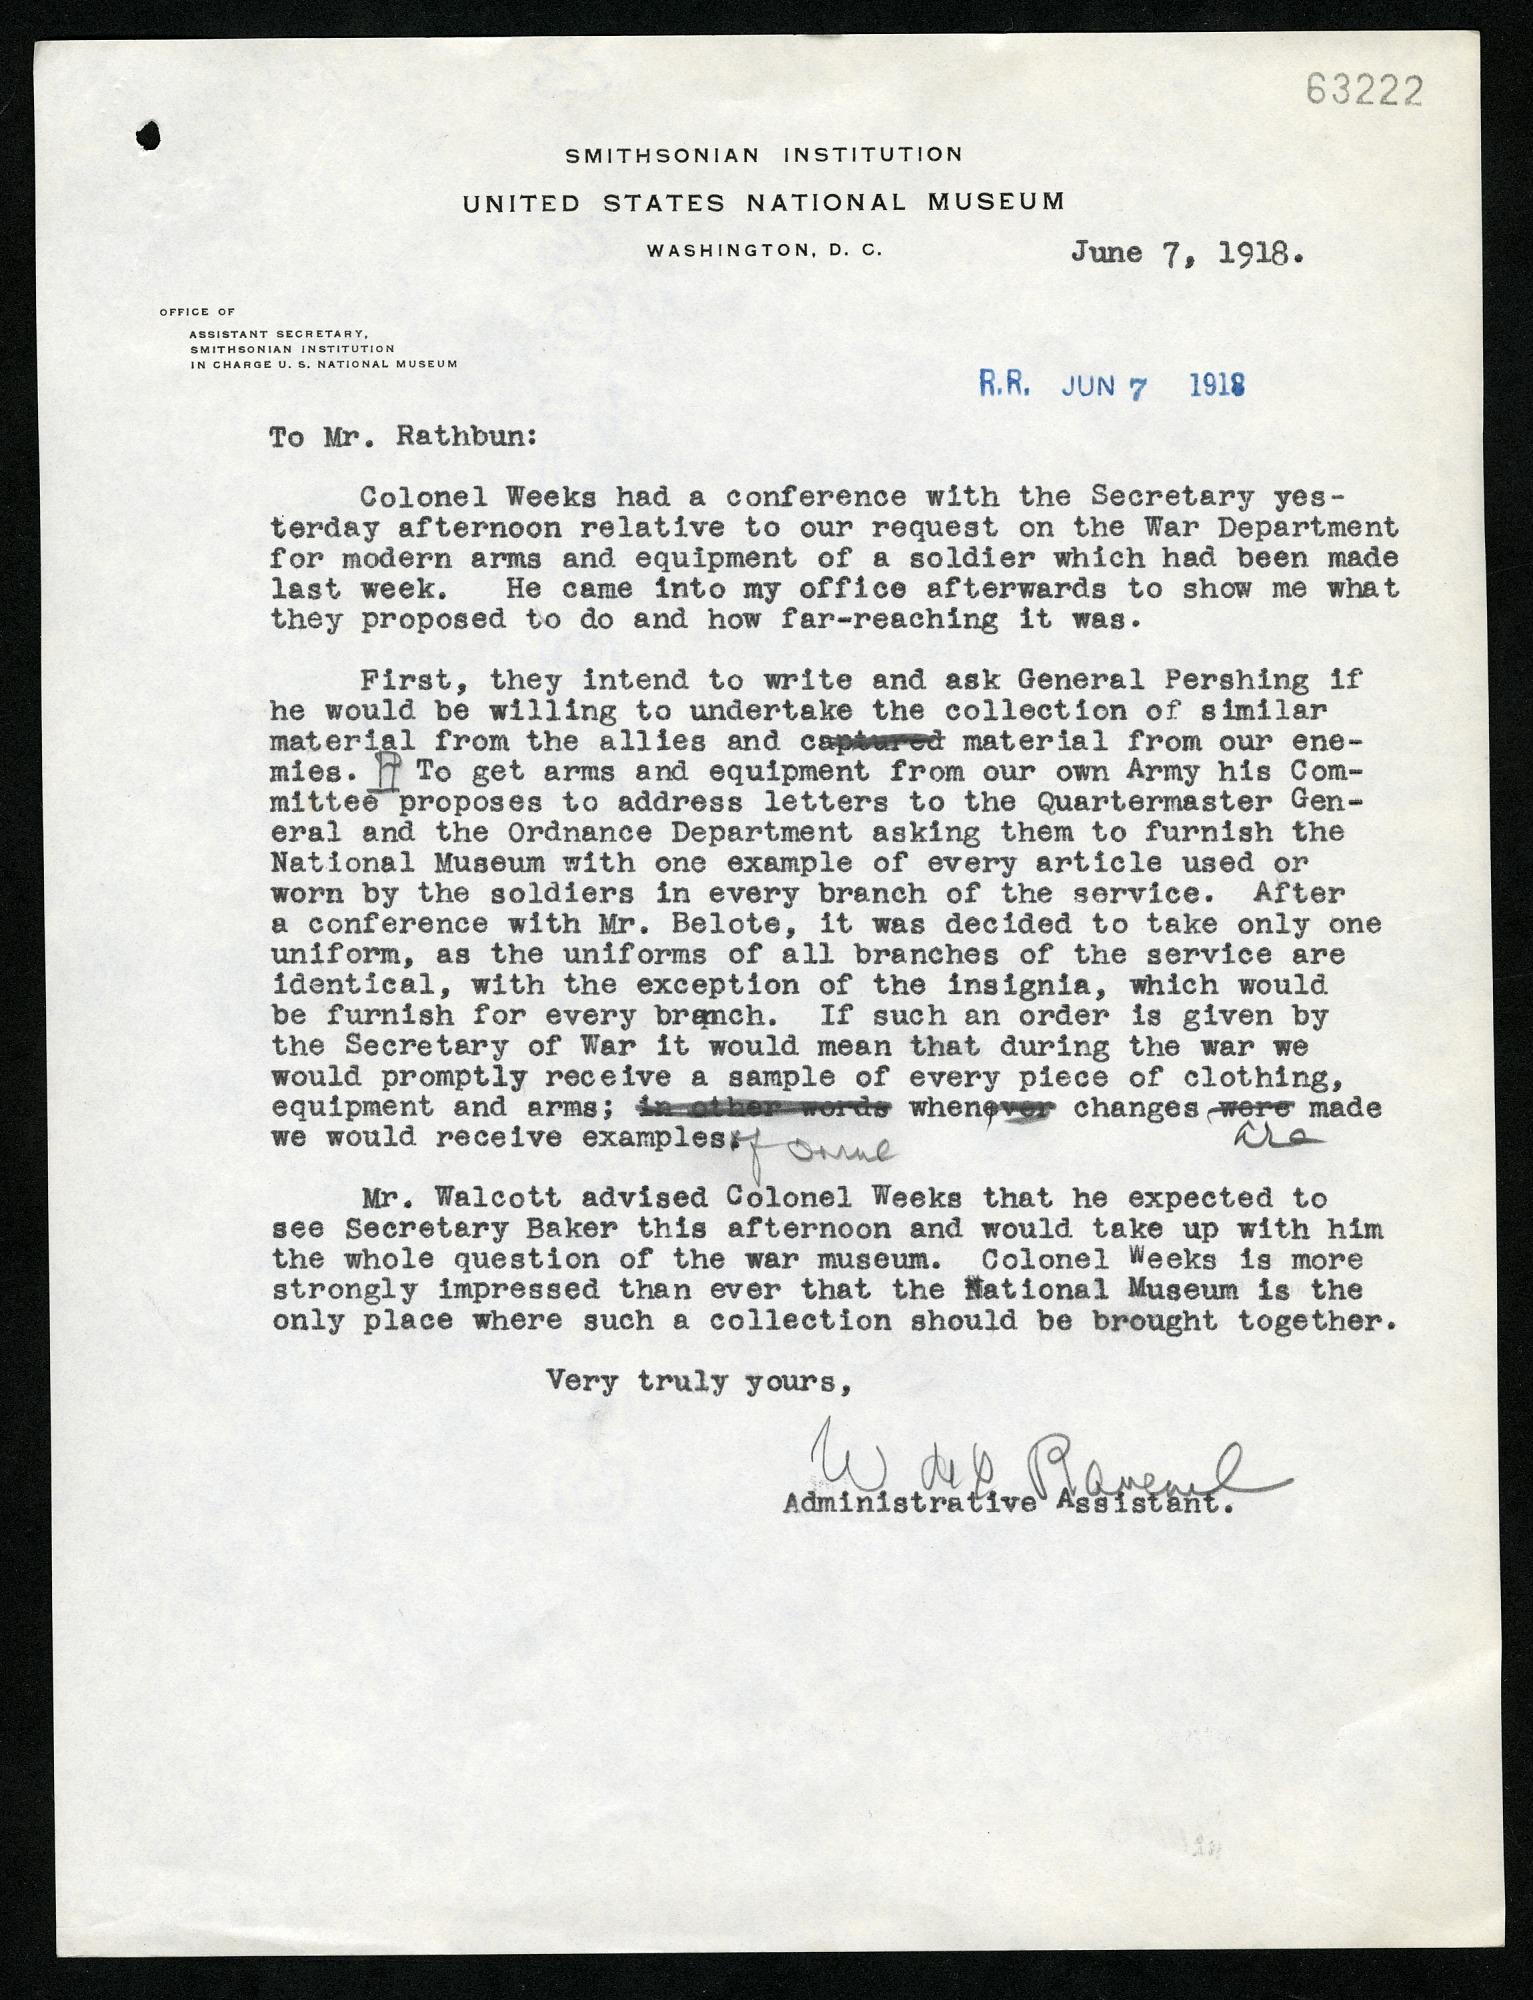 Letter from William deC. Ravenel to Richard Rathbun